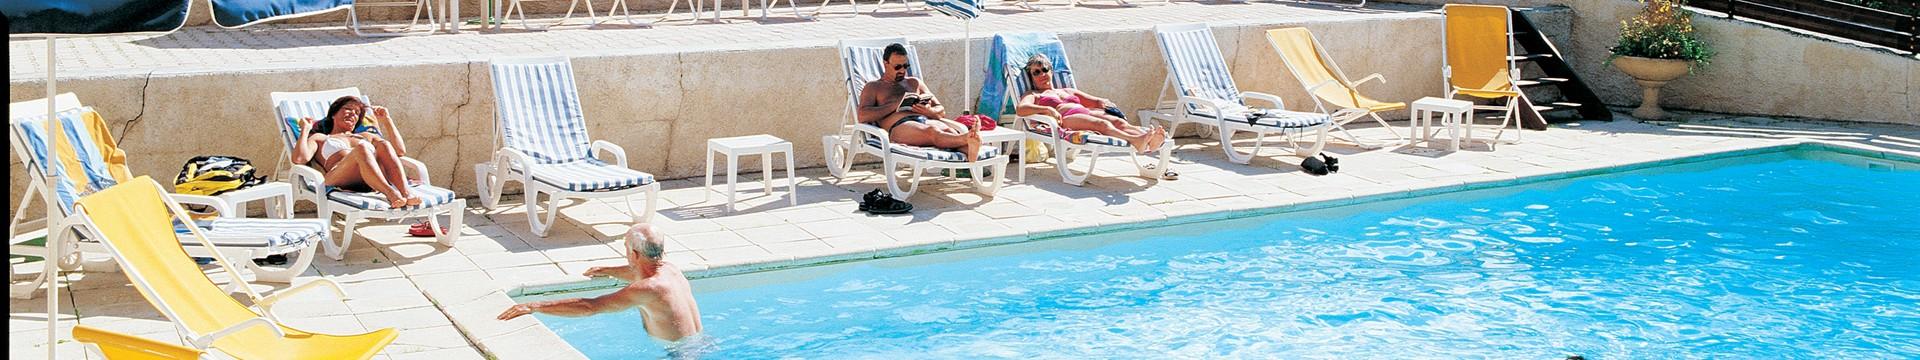 piscine-9195-9834